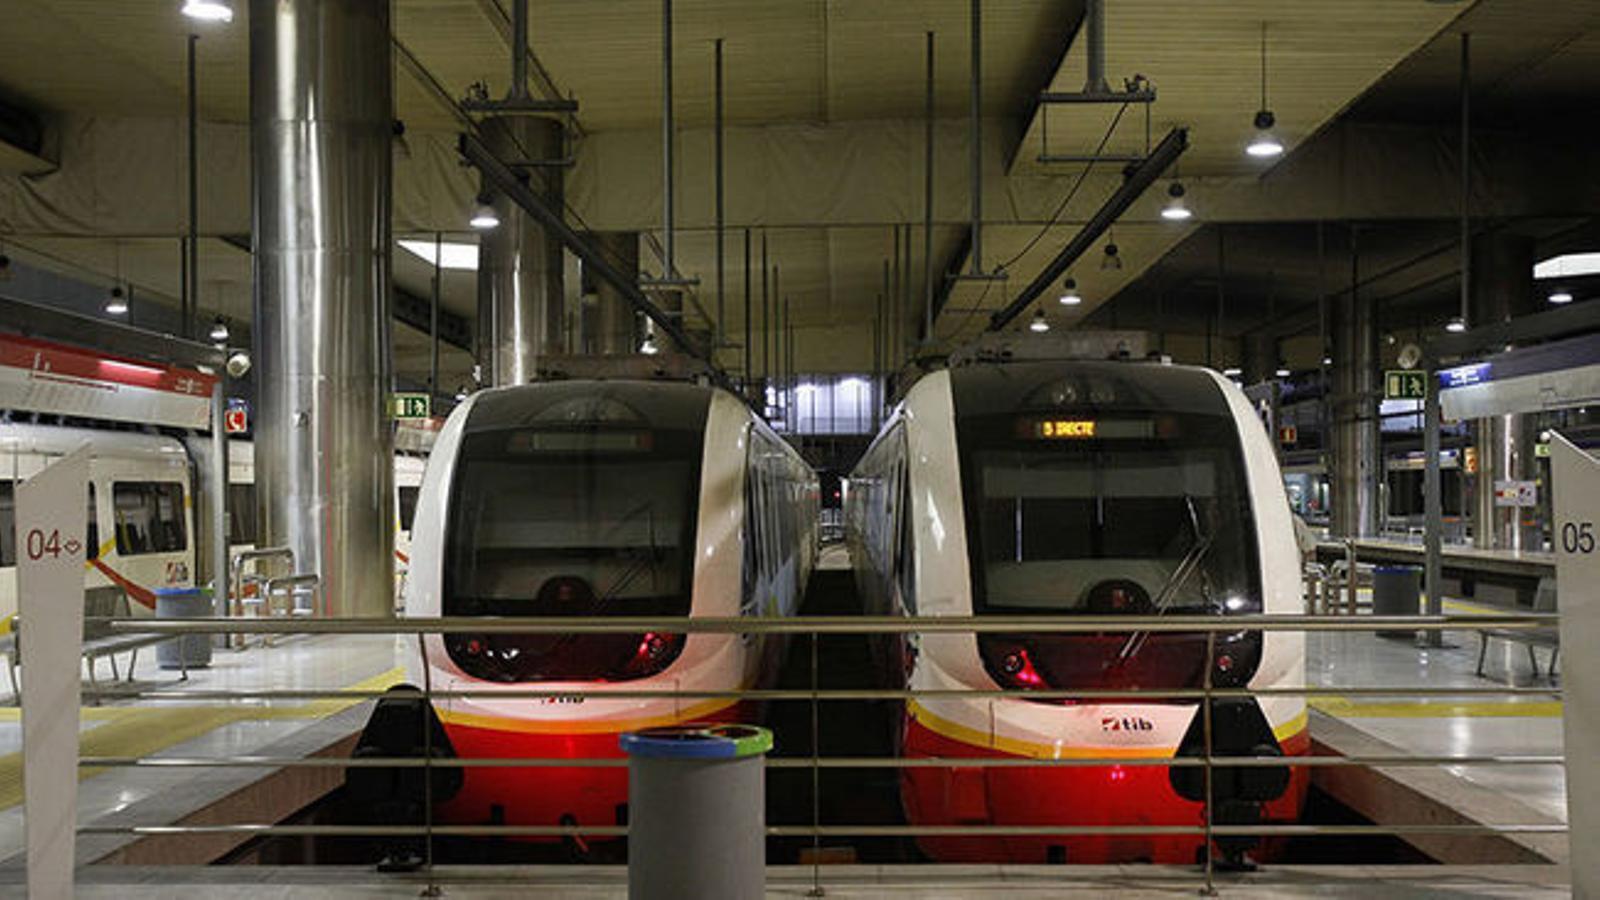 Suspesa la vaga de tren